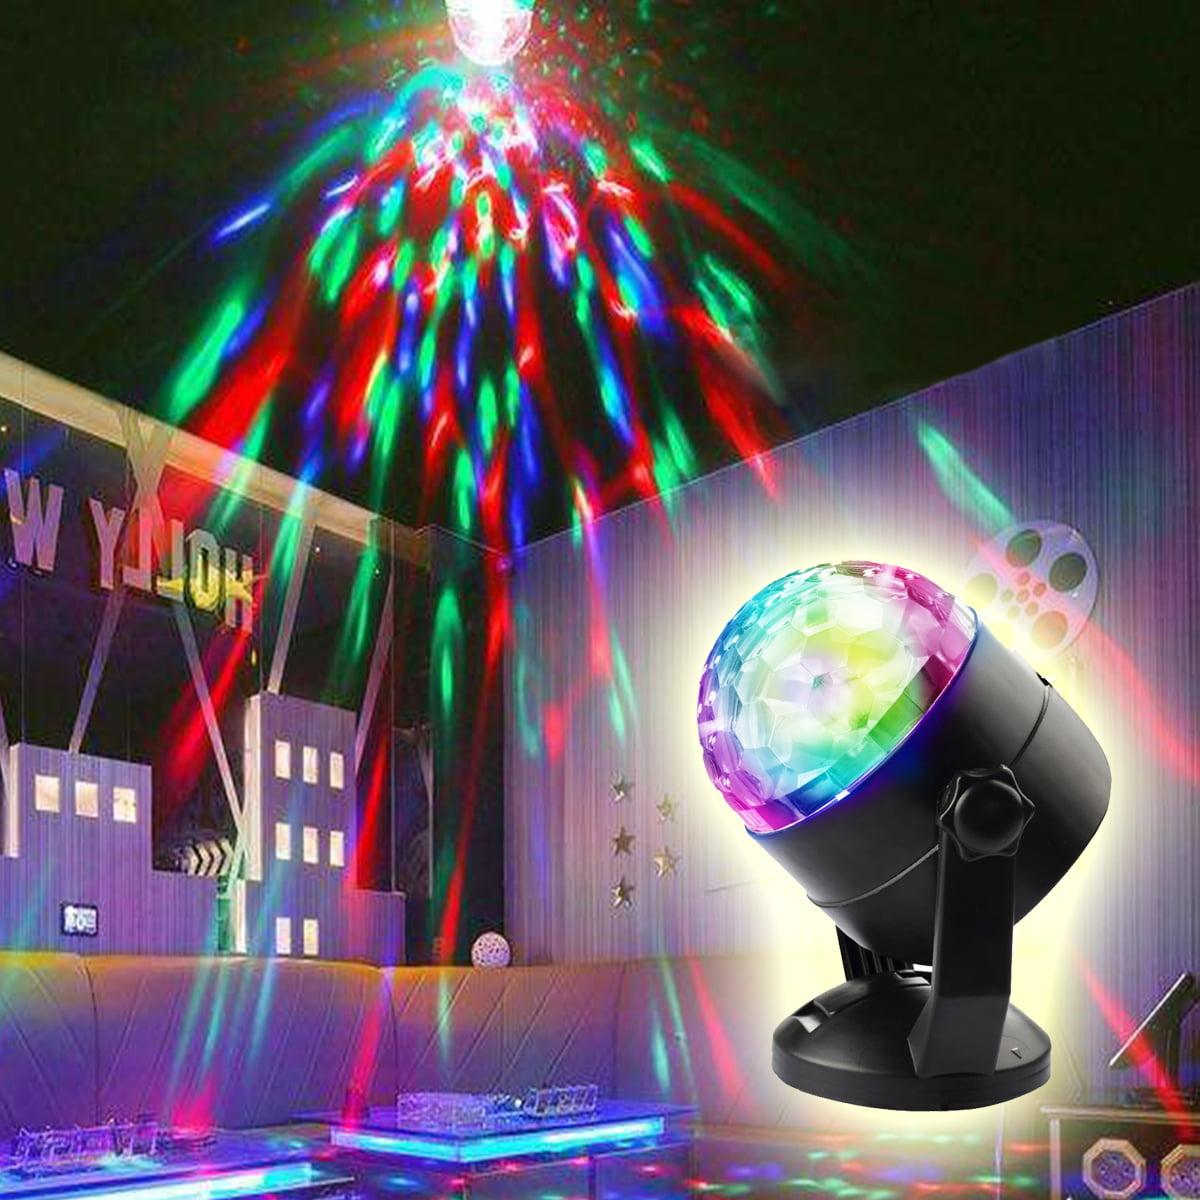 3W Mini RGB LED Crystal Magic Ball Stage Lighting Effect Lamp Bulb Party Disco Club DJ Light for Halloween Christmas... by CoastaCloud